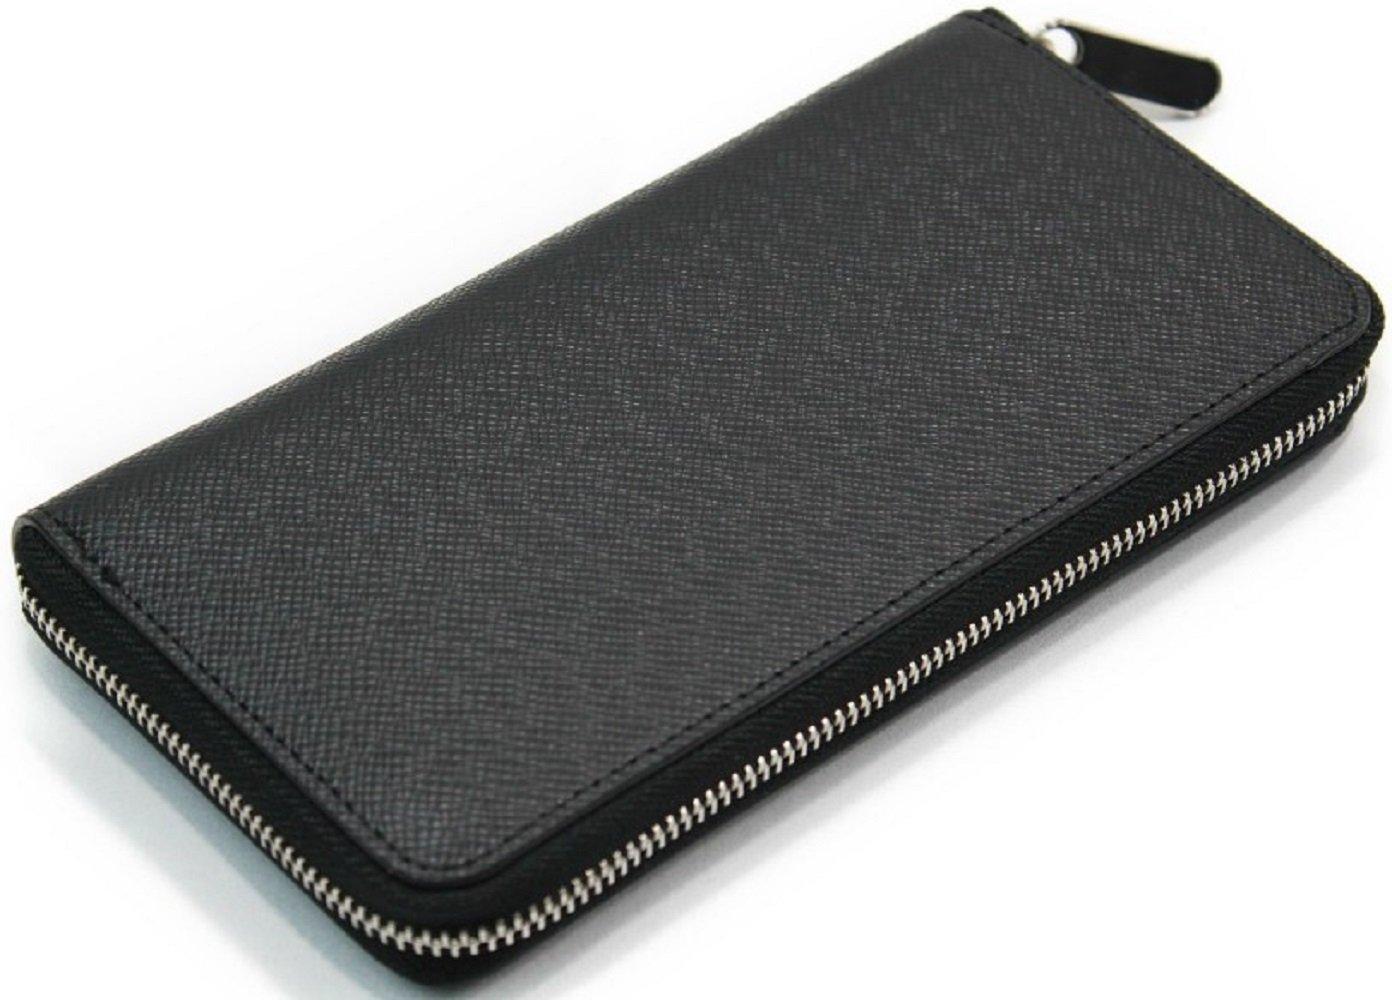 【Shikyou】 Stylish Men's Round Fastner Wallet Purse Embossing (Black) by Shikyou